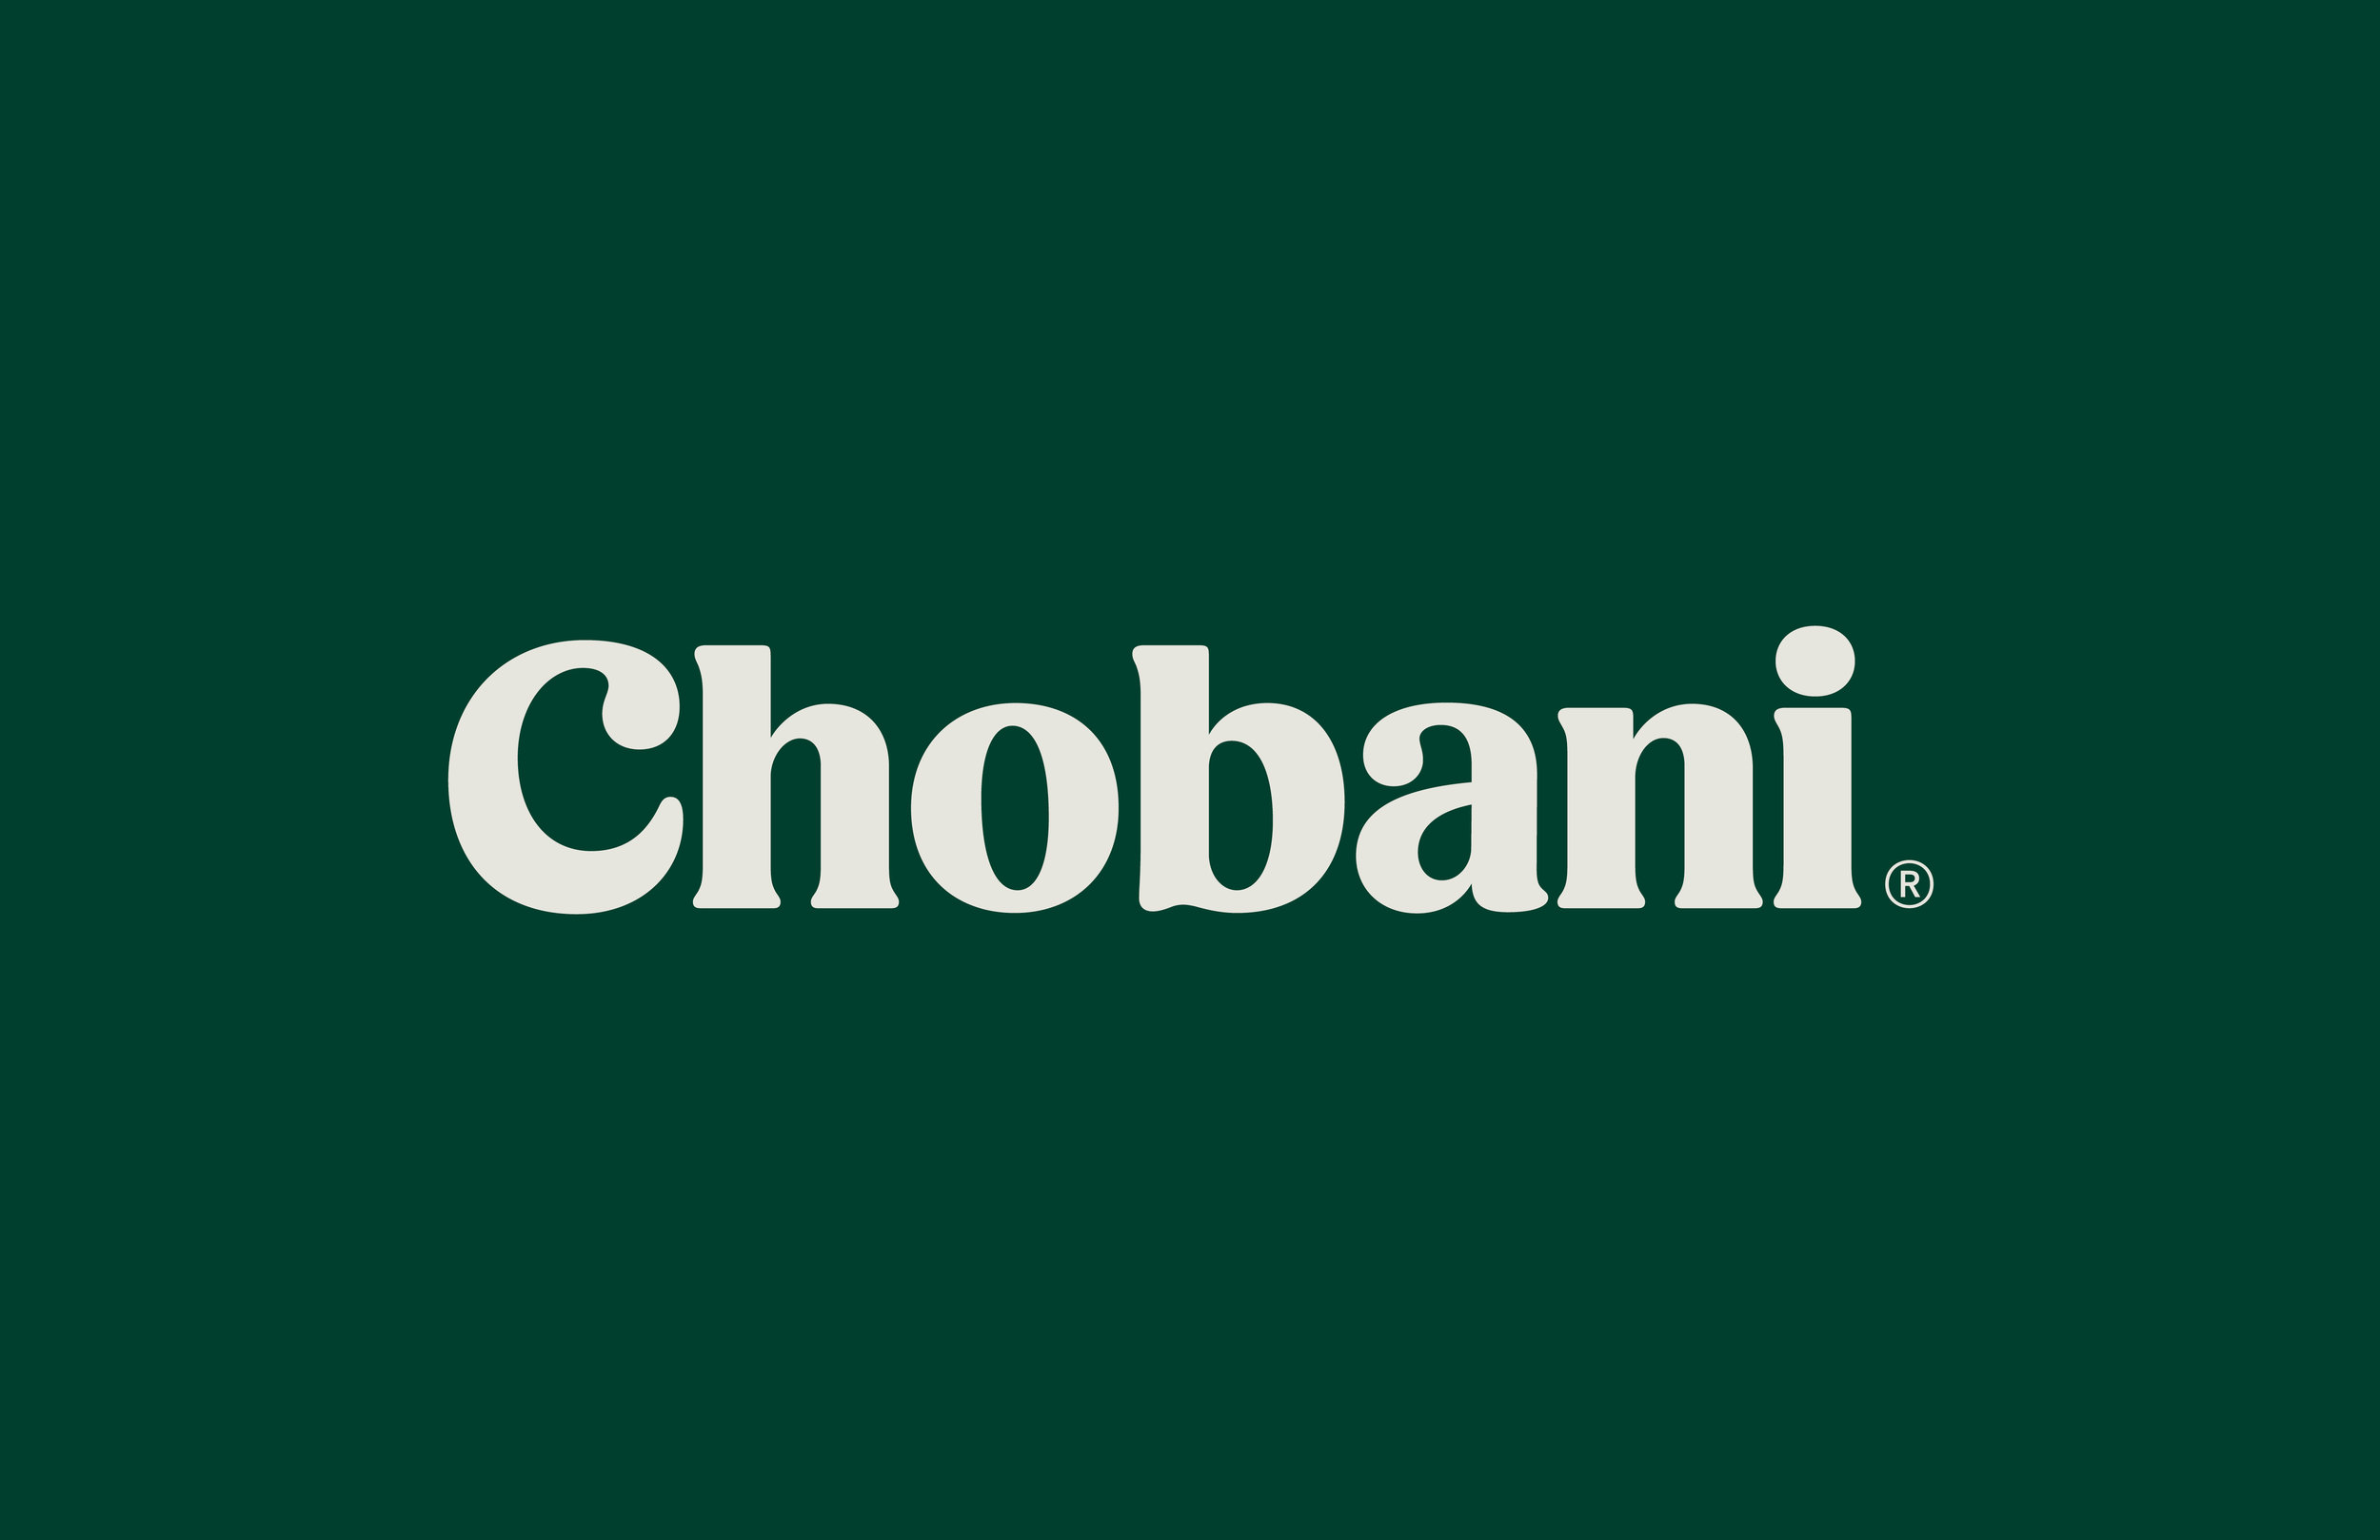 chobani logo clipart #3